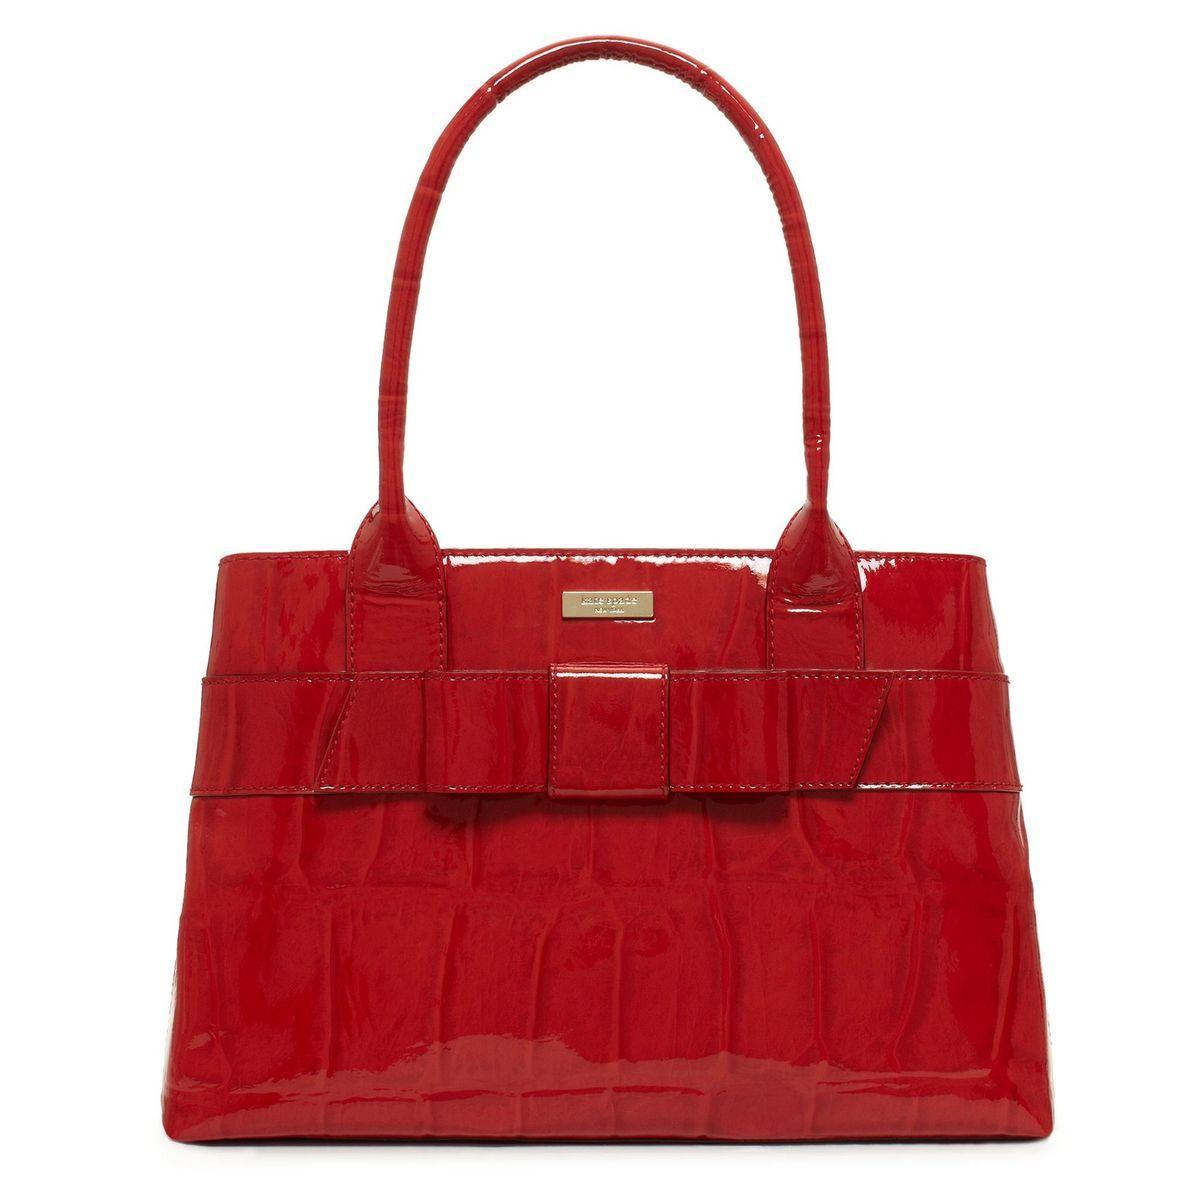 42853df9235f Kate Spade New York Knightsbridge Elena Red Handbag